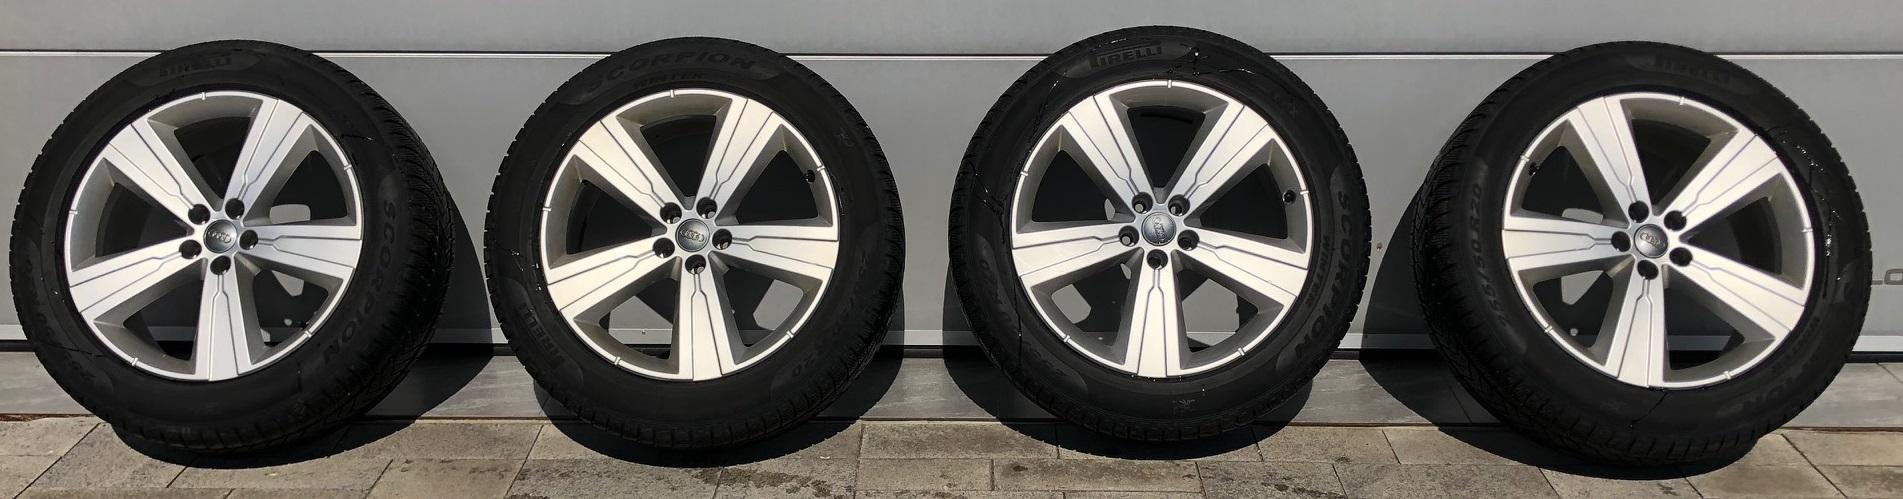 Pirelli   Originalní zimní kola Audi q7/sq7 + Zimní pneu Pirelli SCORPION WINTER AO XL 255/50 R20 10